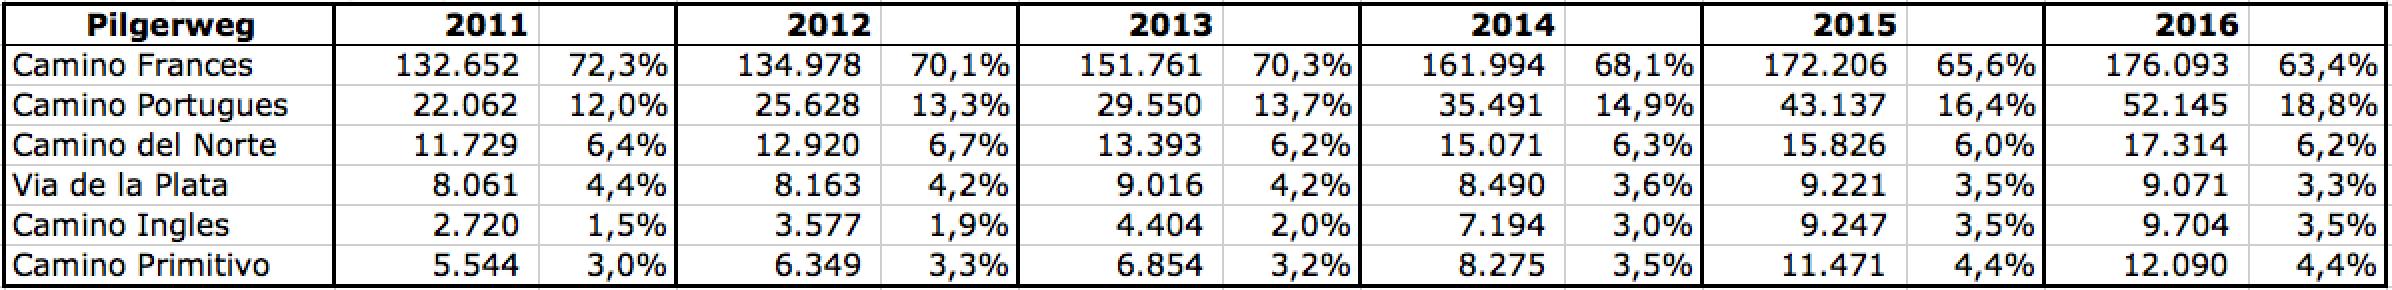 pilgerweg-statistik